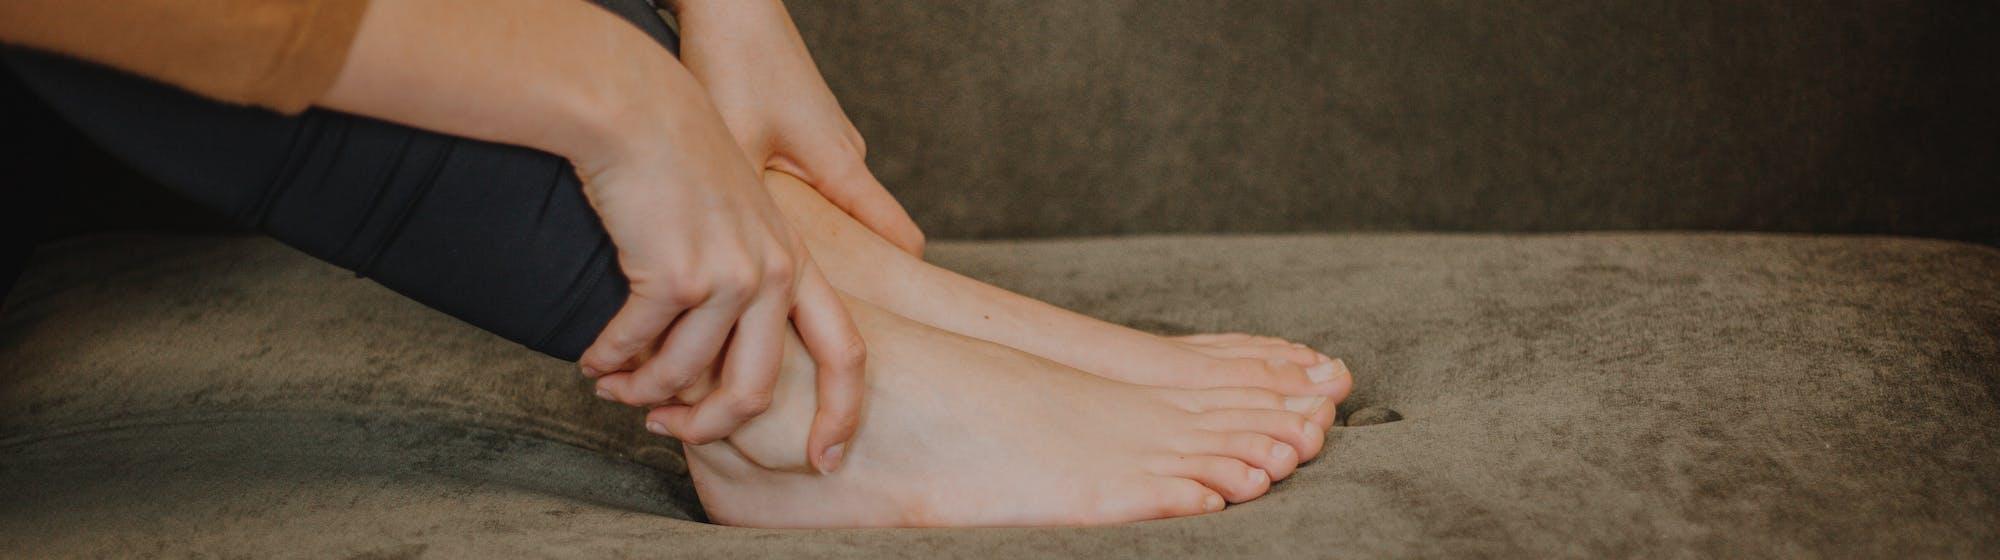 Fußschmerzen Knöchel